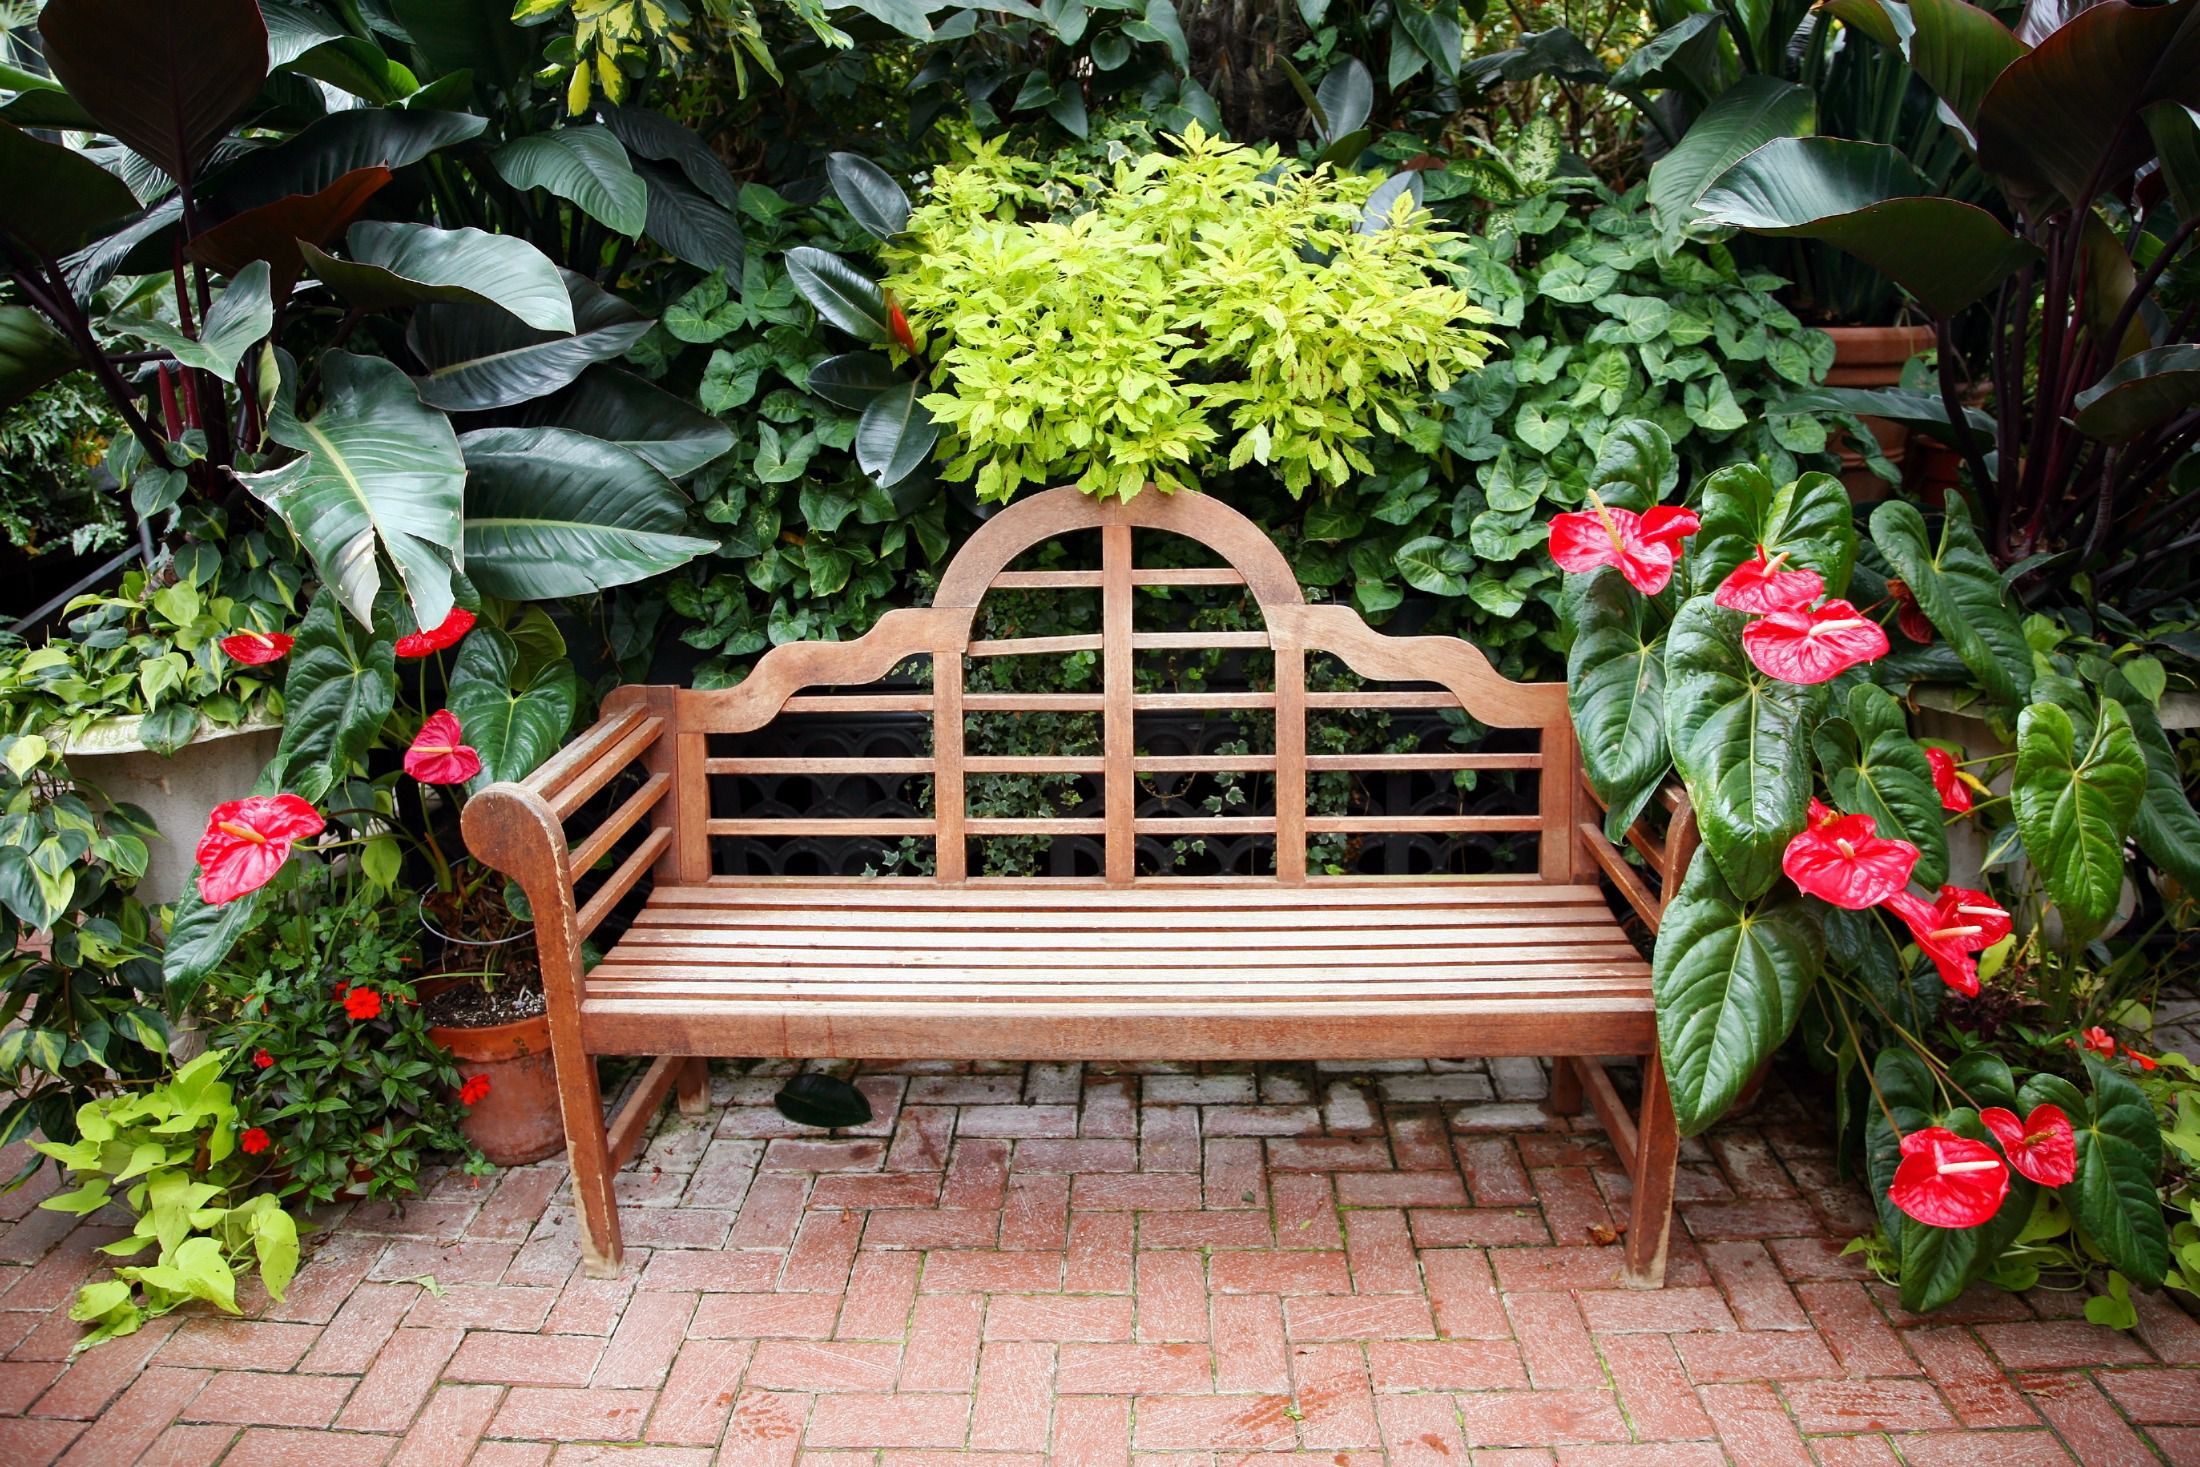 12 Great Brick Patio Designs on Backyard Brick Patio id=49167